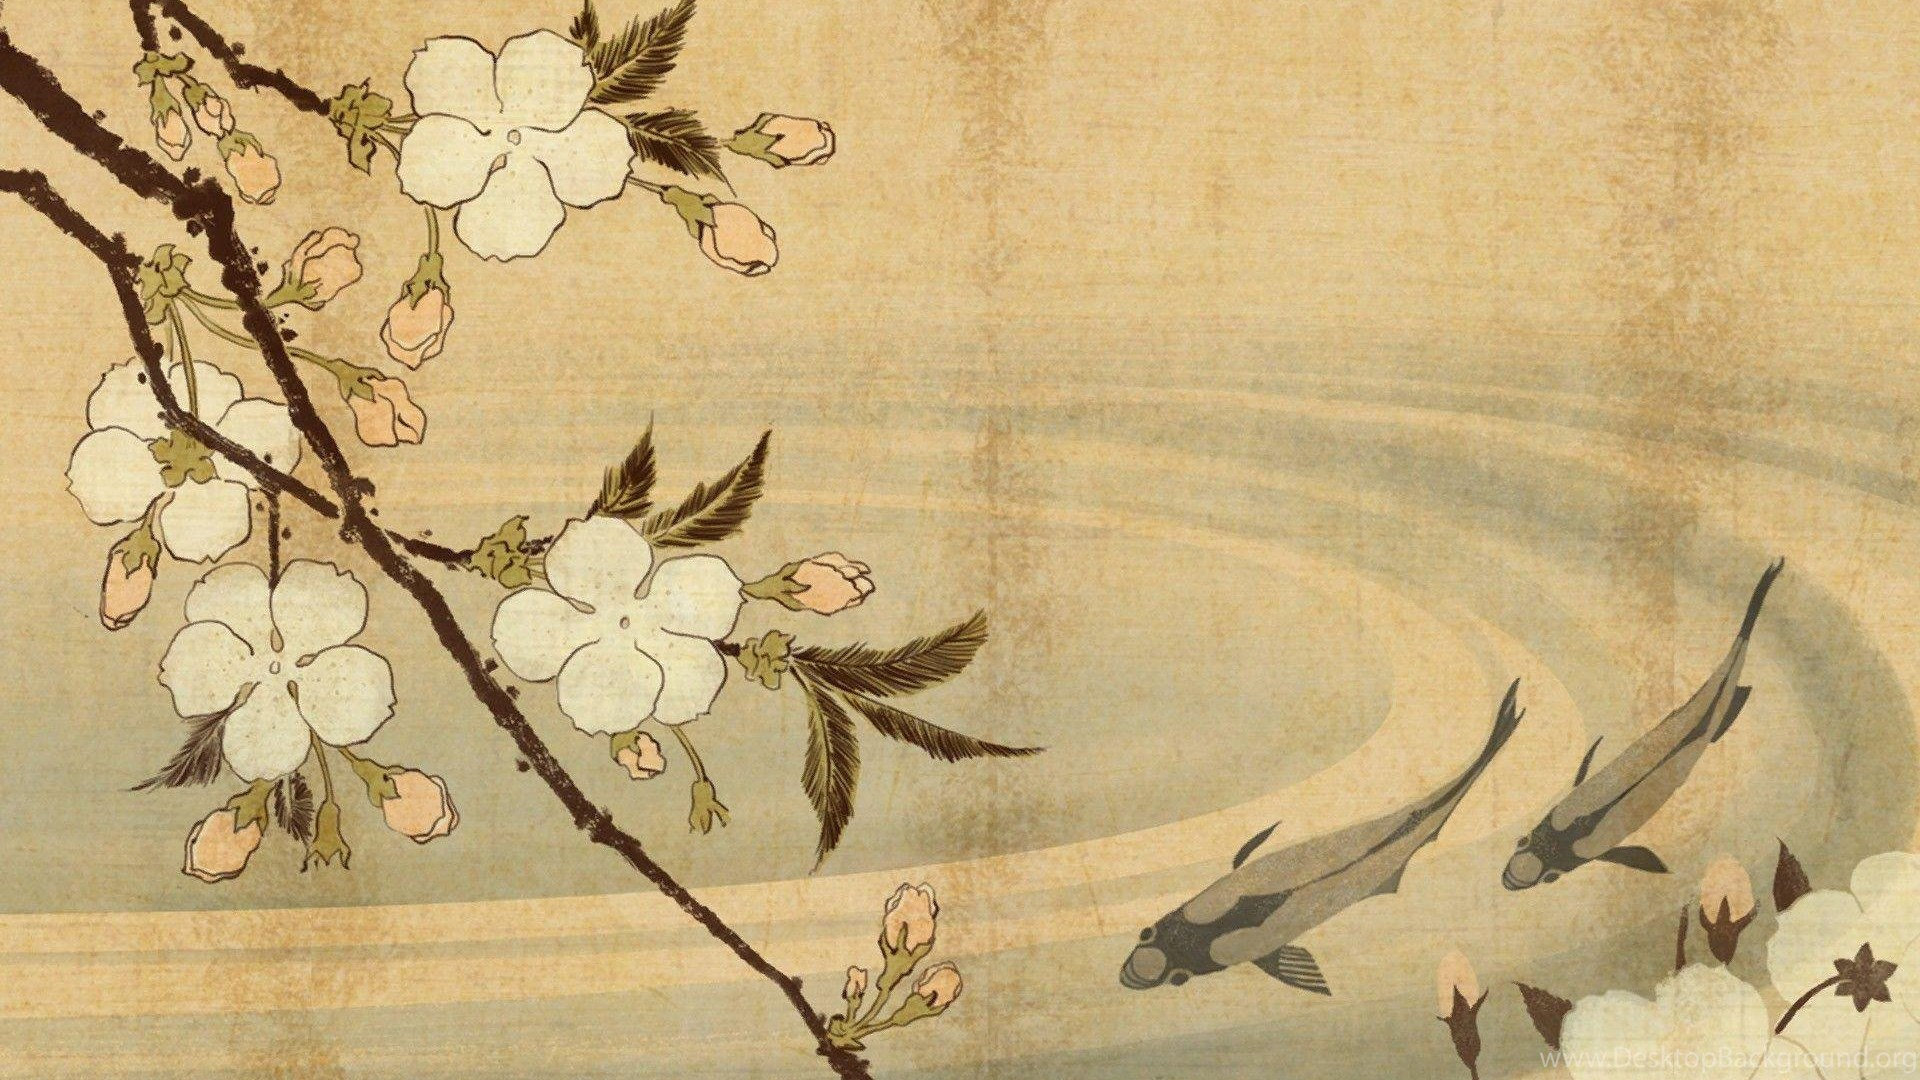 total war shogun ii wallpaper,digital art hd wallpaper,1920x1200